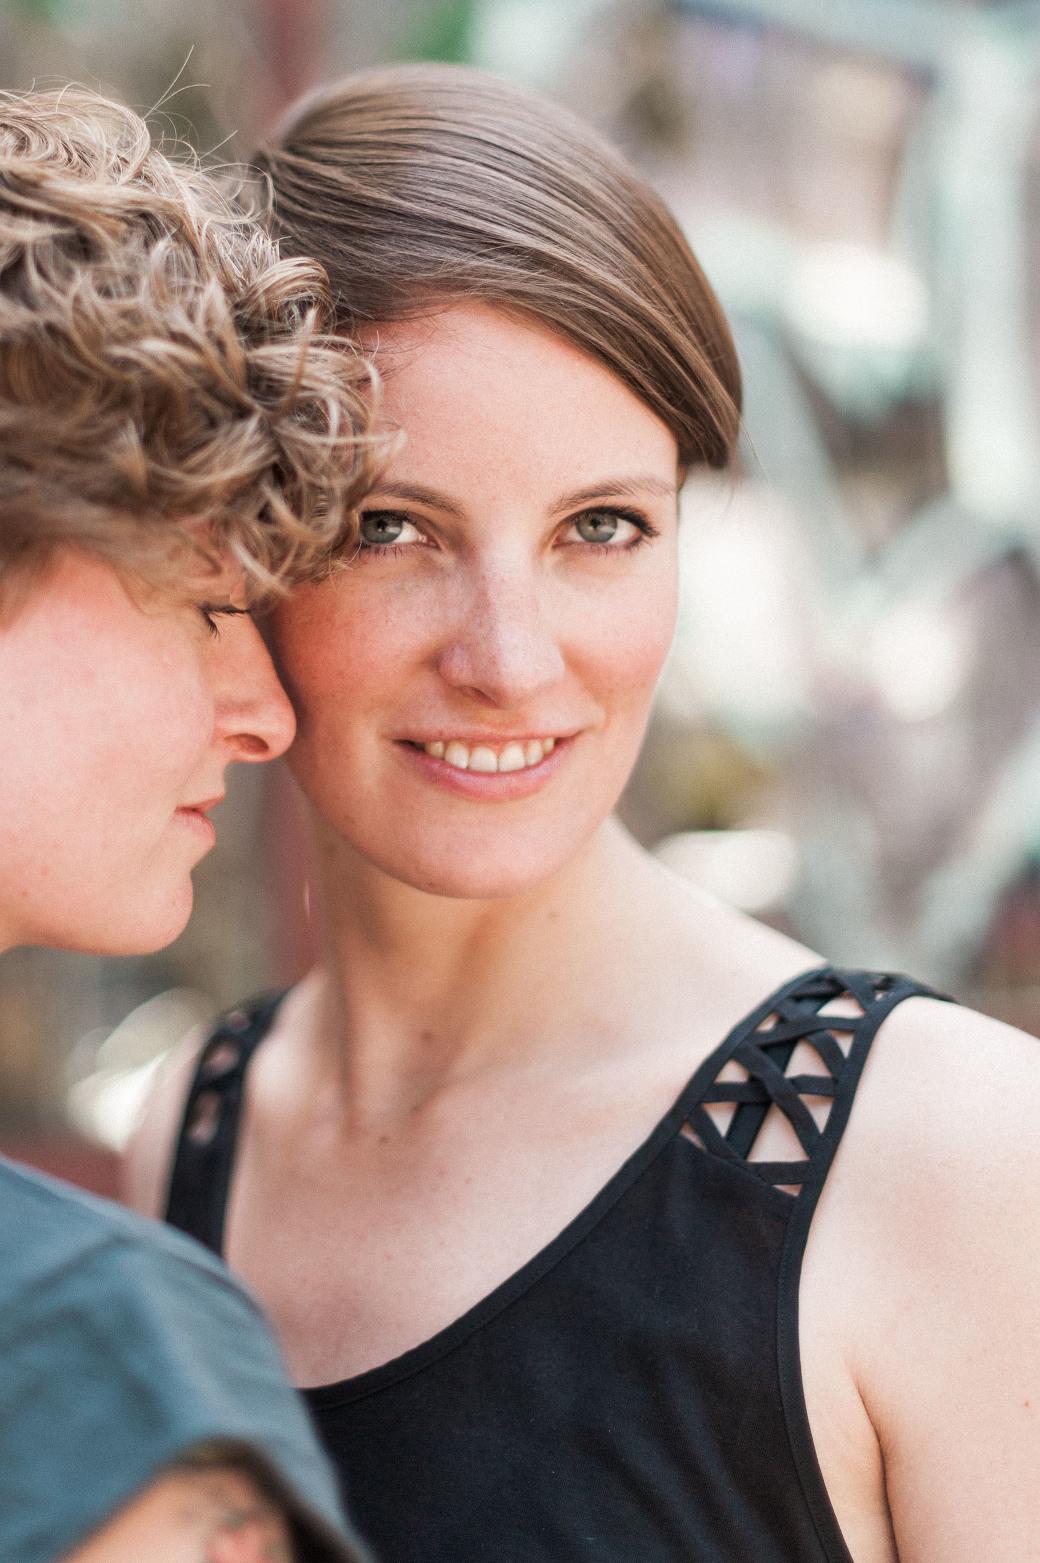 Ana & Stefanie - A Lesbian Portrait Session in Berlin photographed by LGBT Portland Wedding Photographer Briana Morrison